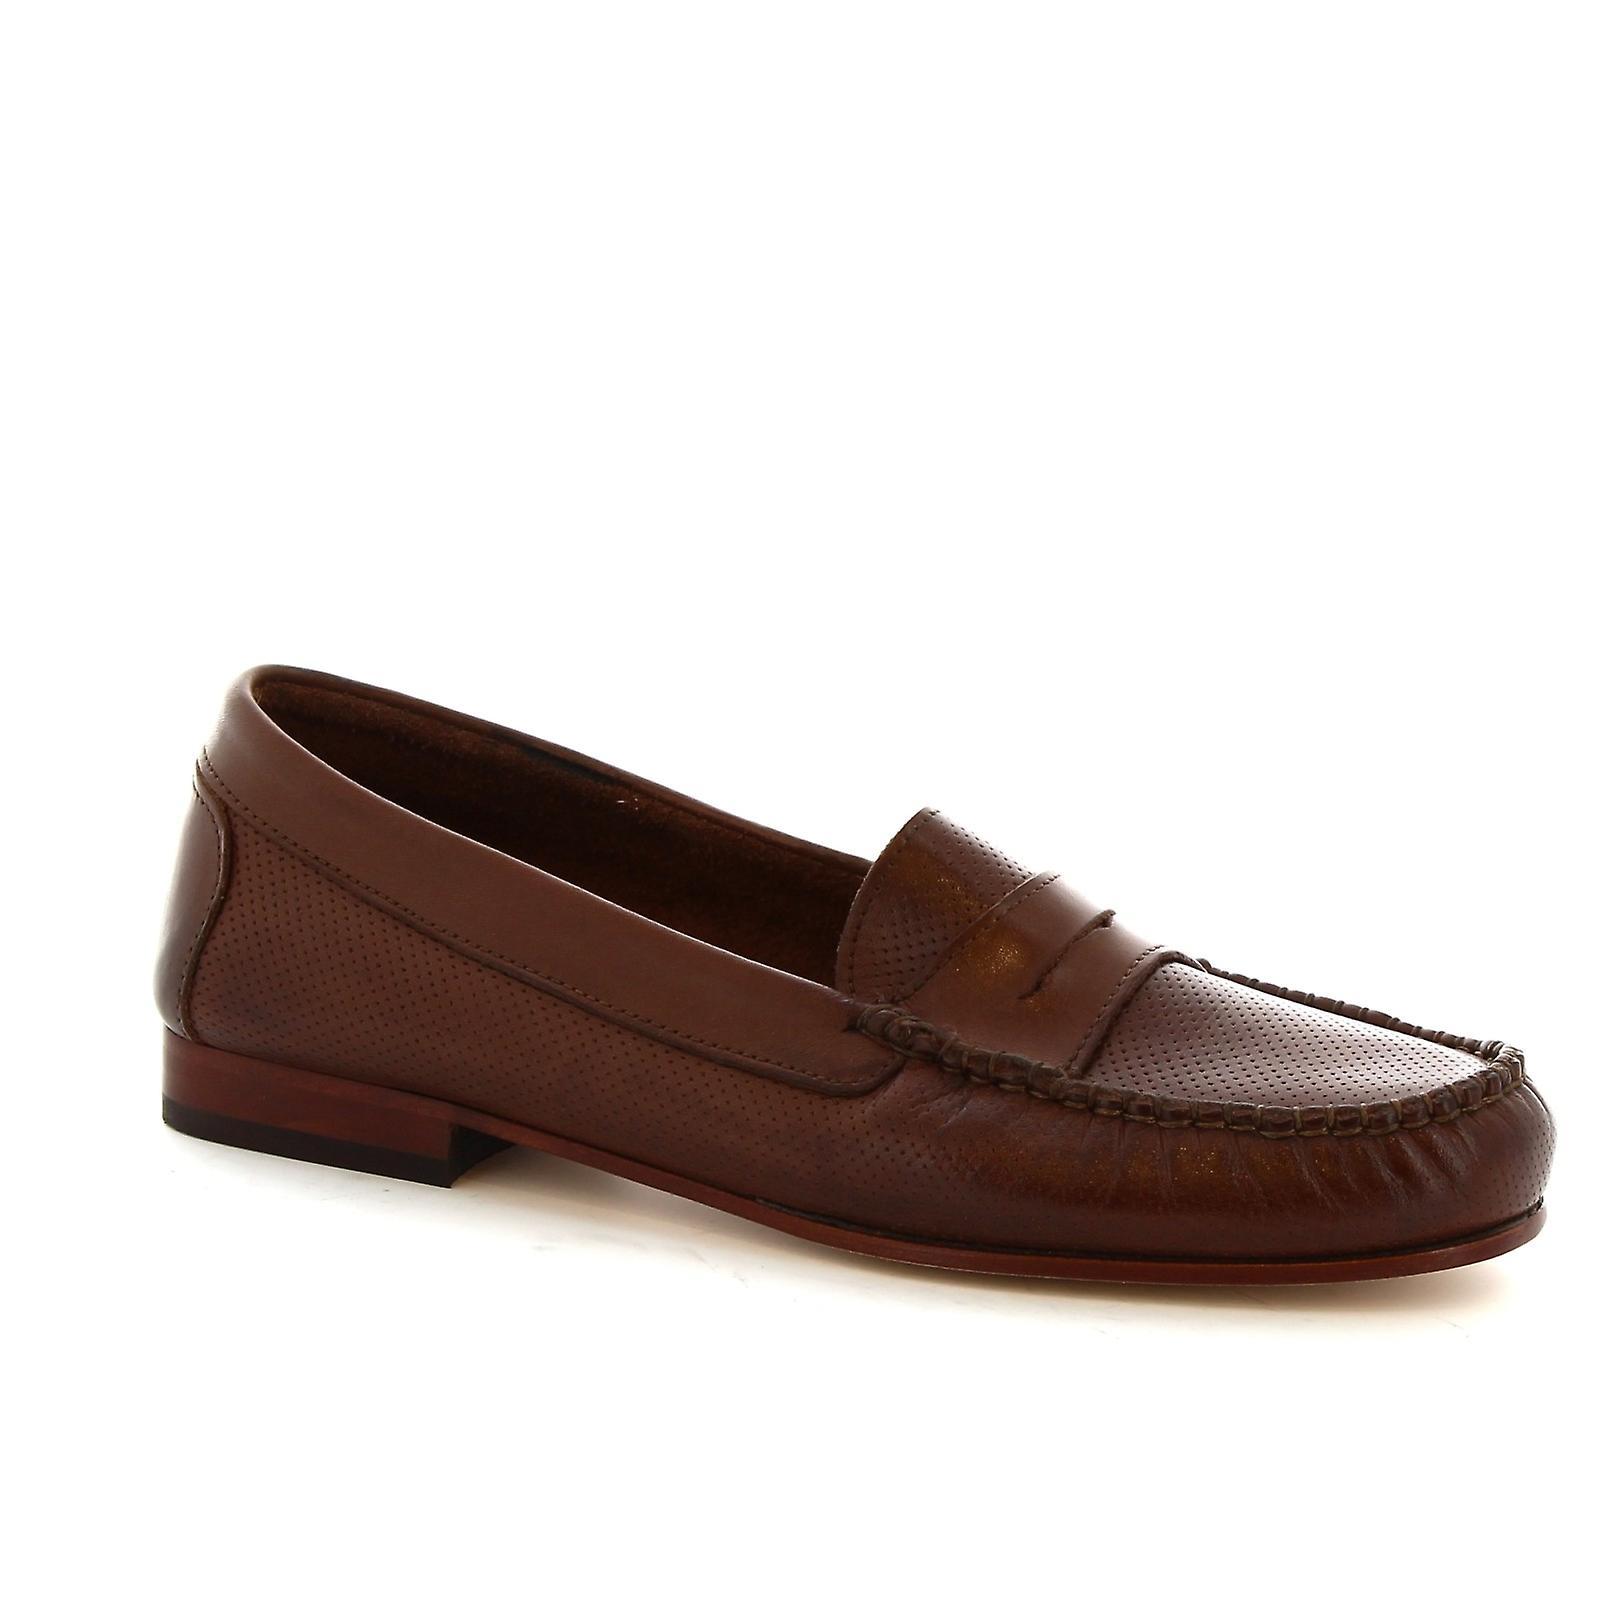 Leonardo Shoes Women's handmade loafers in openwork dark brown calf leather 6LxYo